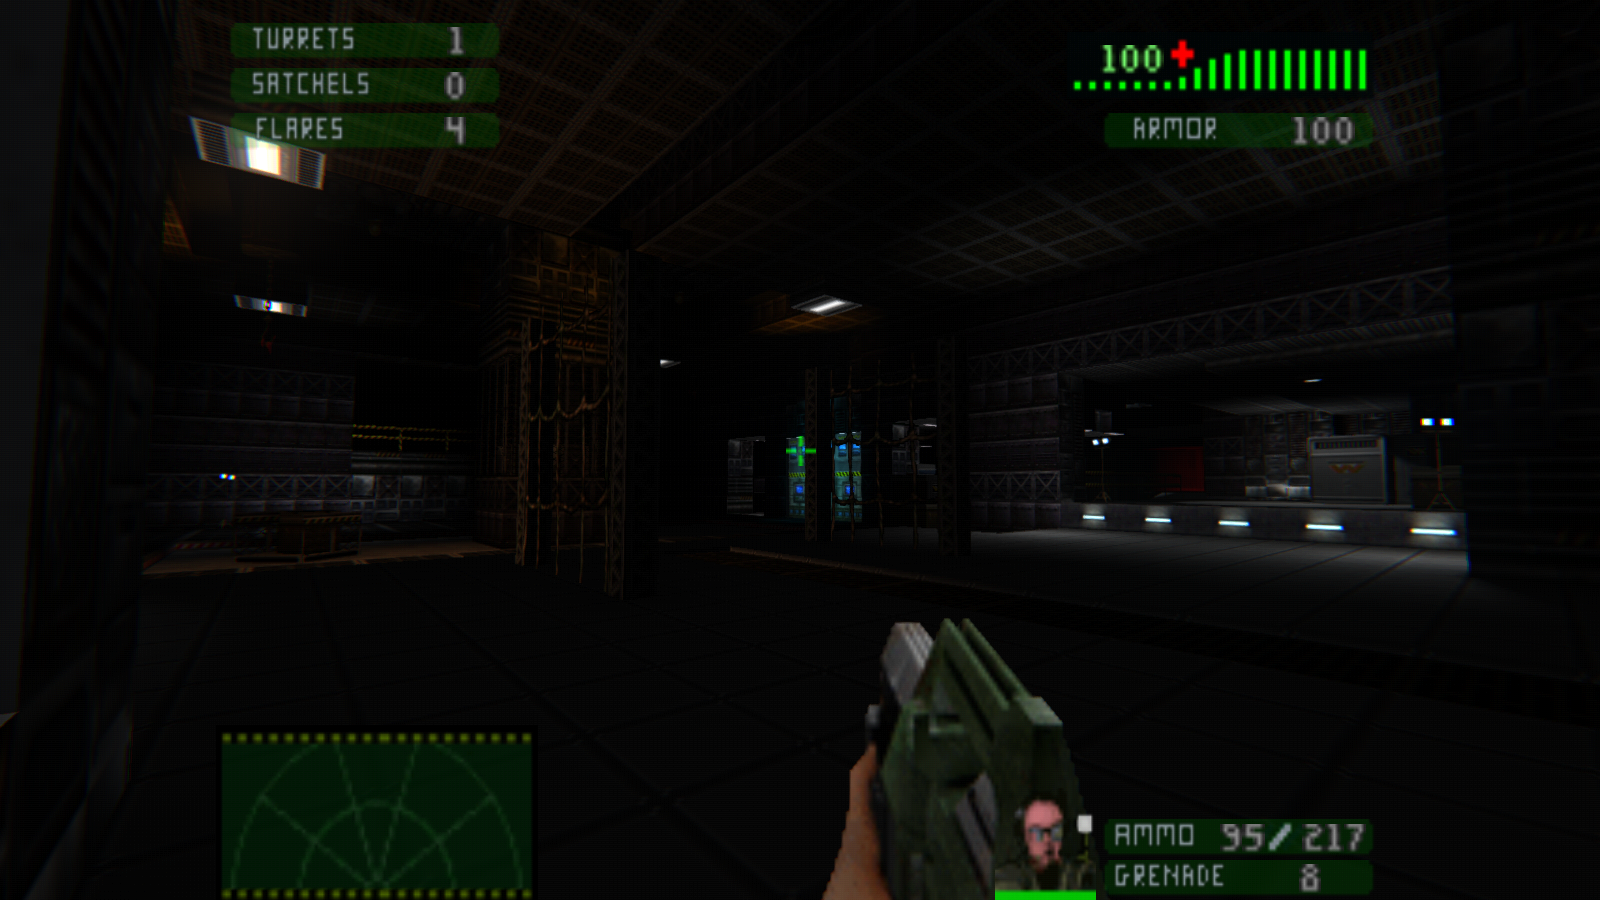 Screenshot_Doom_20201208_170456.png.4e849c7f09bd281e4f52045ab8e85a2d.png